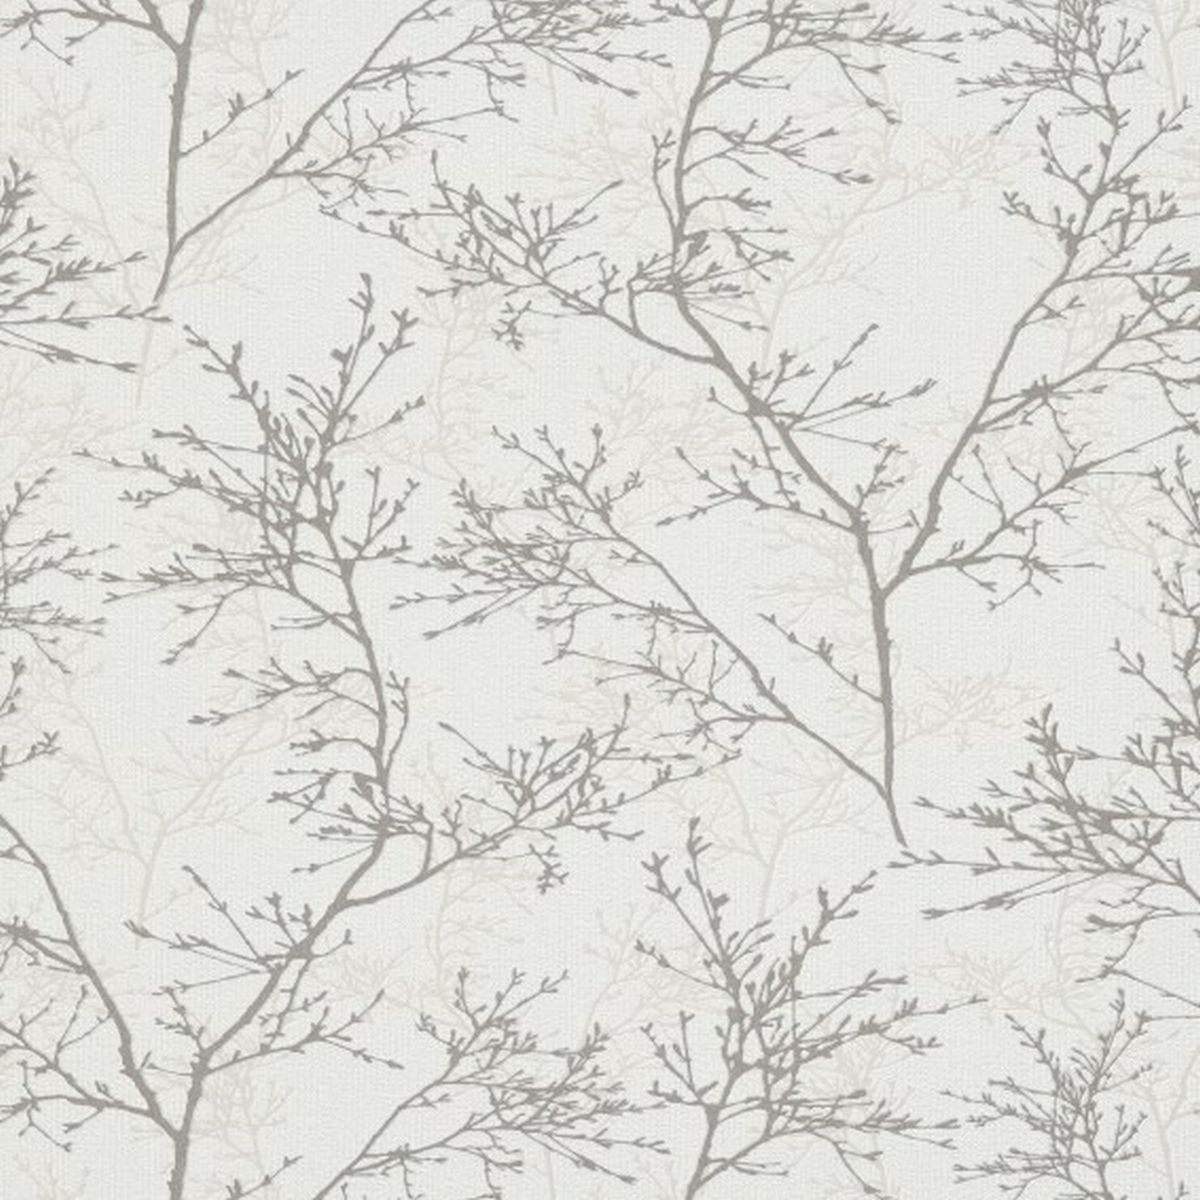 Erismann Vliestapete Kollektion Instawalls 543238 Blumen